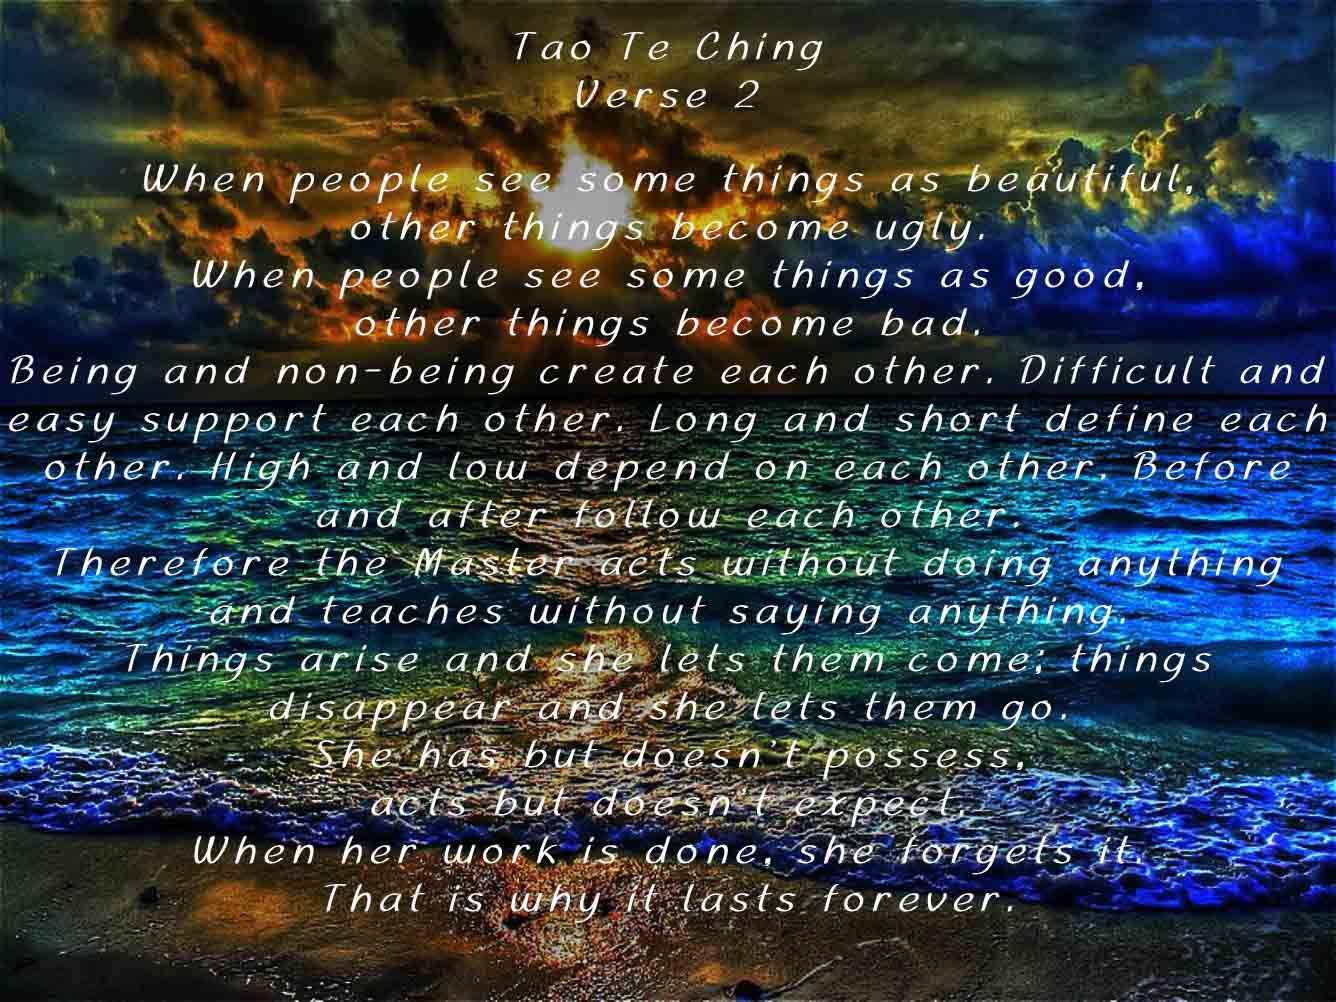 tao te ching verse tao tao te ching verses and  tao te ching verse 2